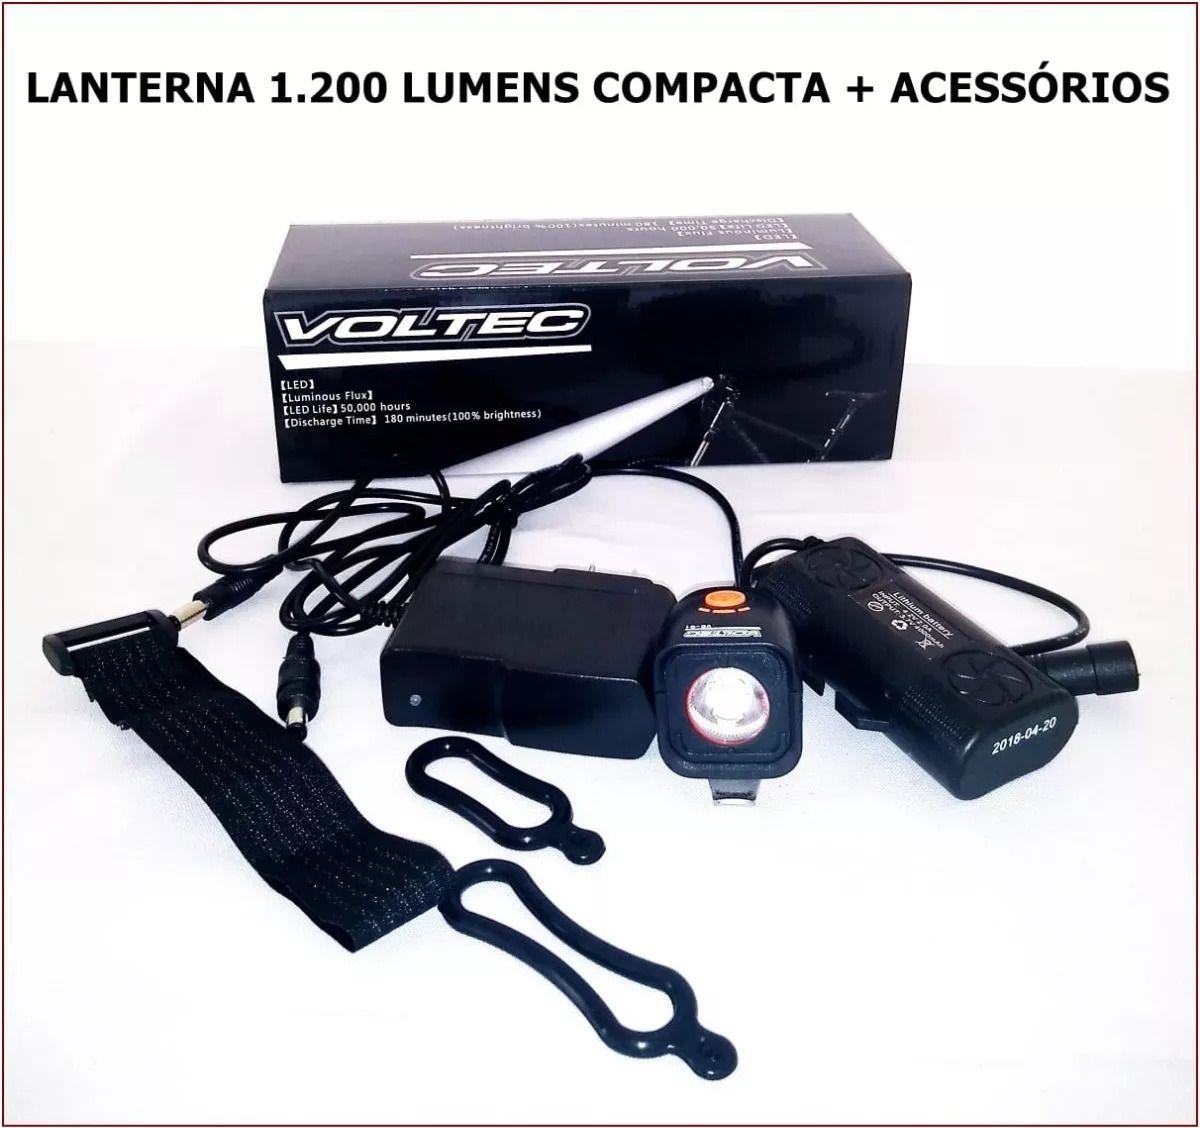 Farol Compacto Voltec Vo-q3 1200 Lumens Bateria Selada